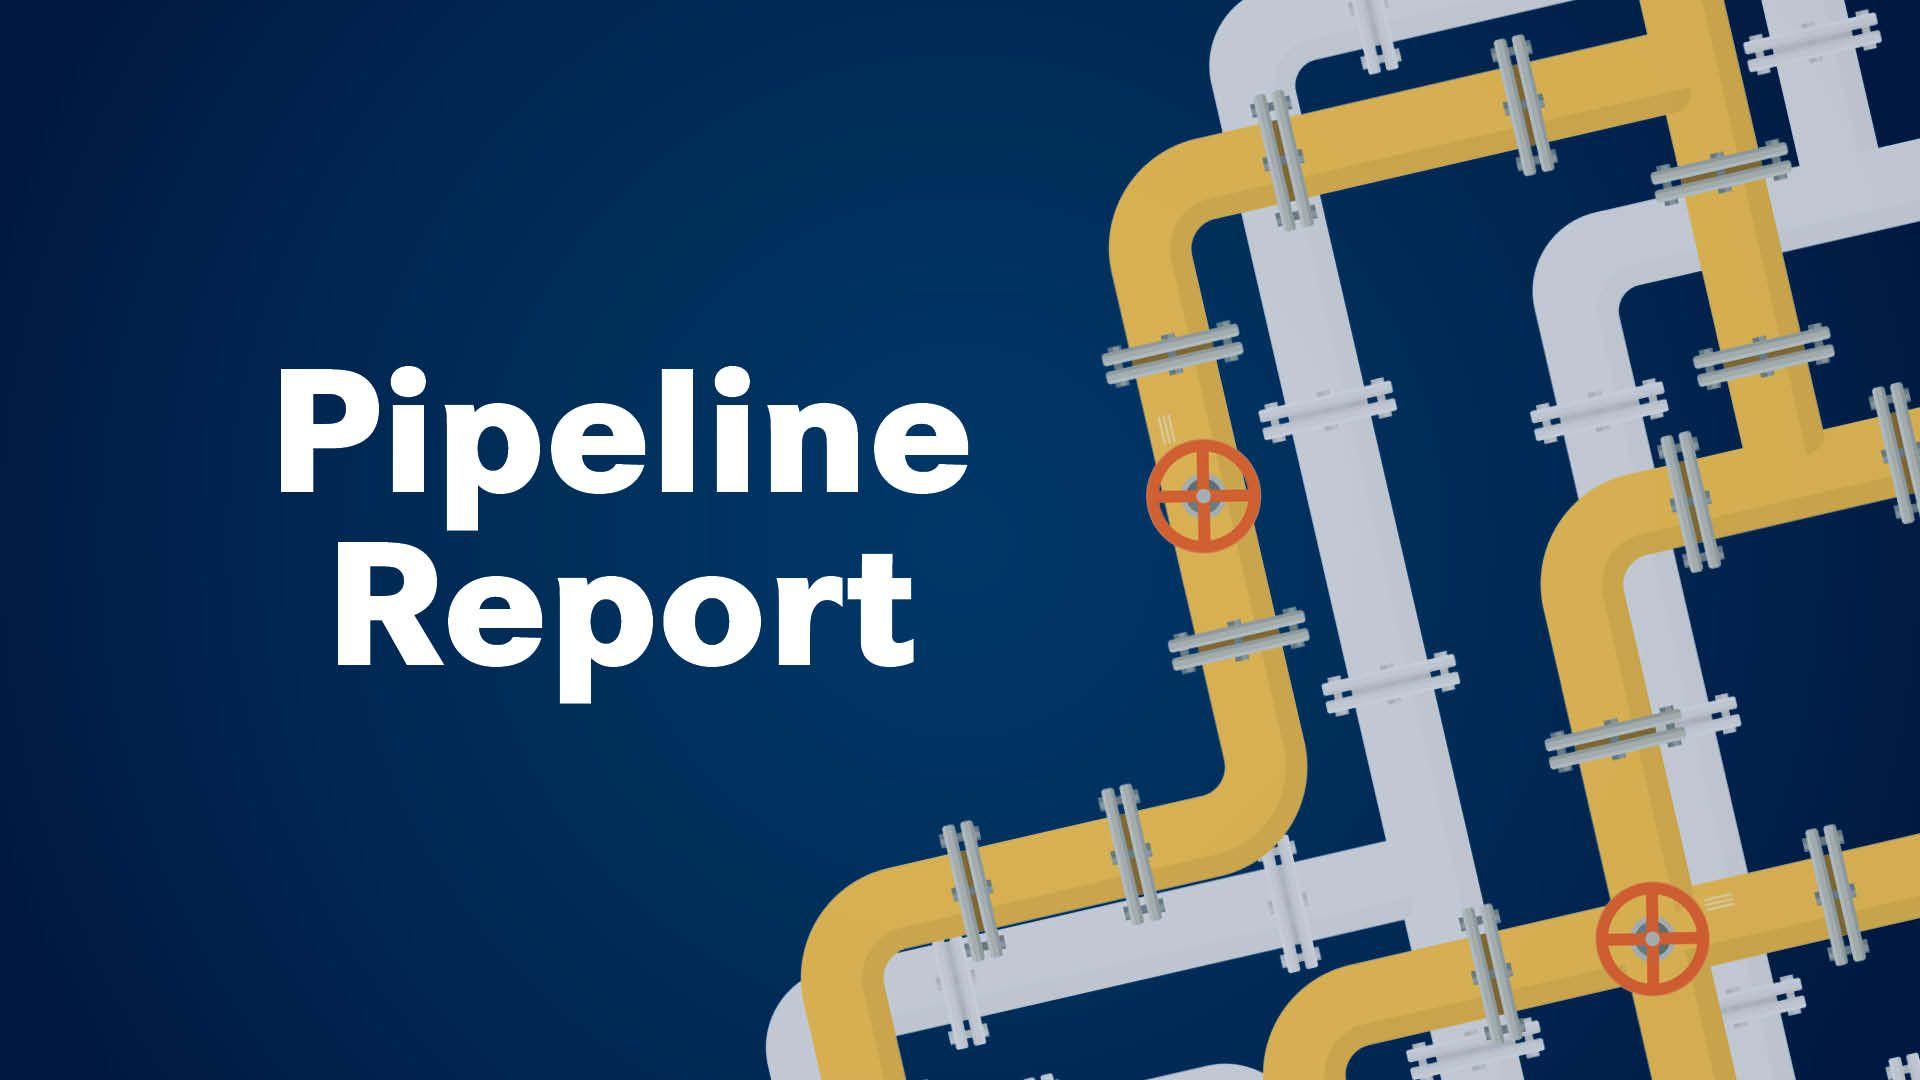 Pipeline Report: July 2021